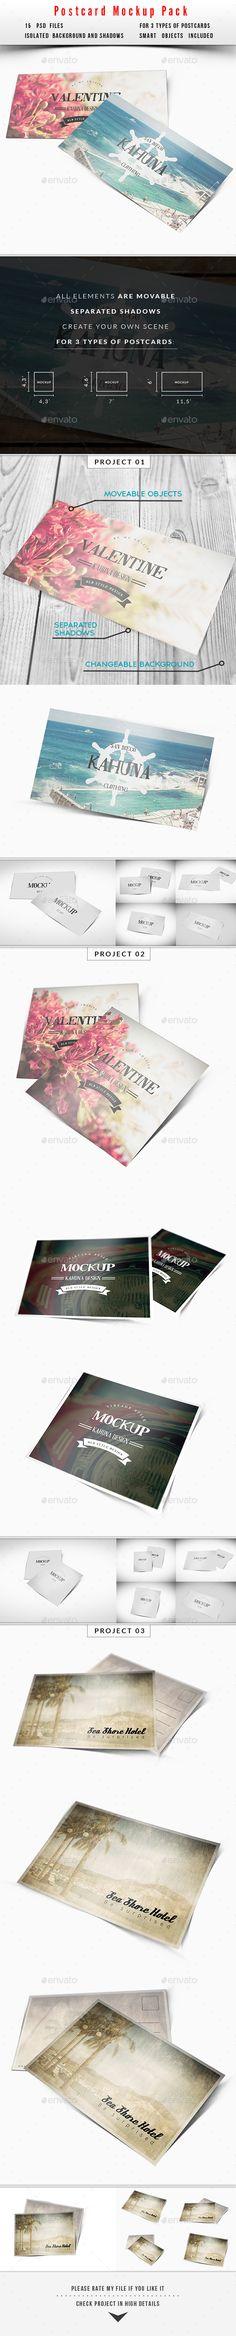 Postcard / Invitation Mockup Pack #postcardmockup #invitationmockup Download: http://graphicriver.net/item/postcard-invitation-mockup-pack/10534707?ref=ksioks